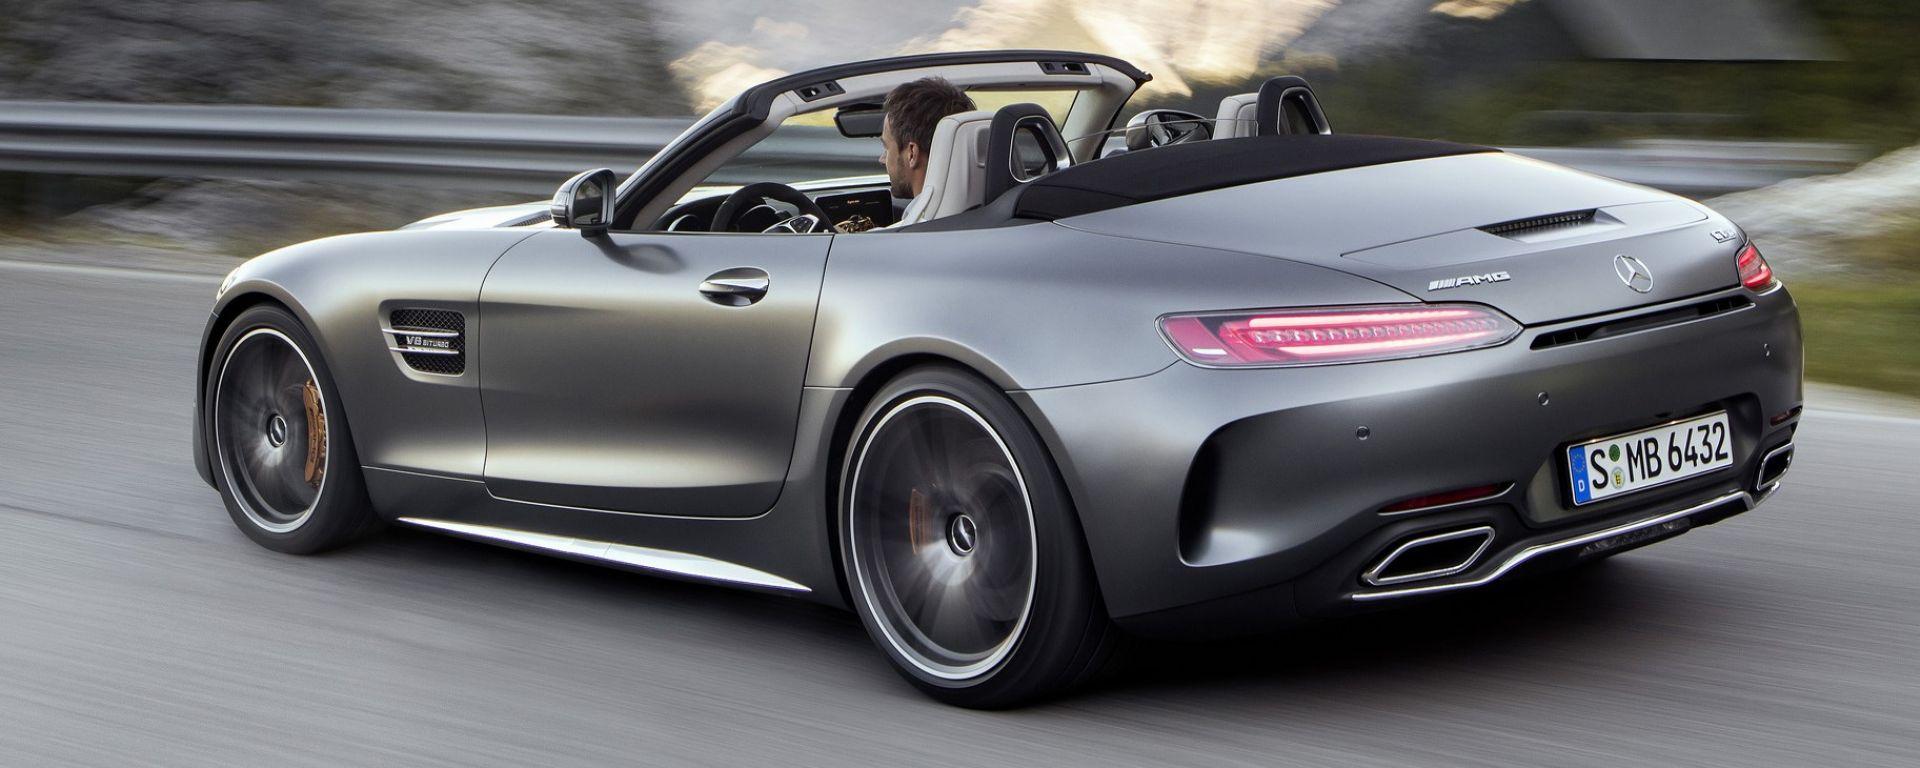 Mercedes AMG GT Roadster, debutto al Salone di Parigi